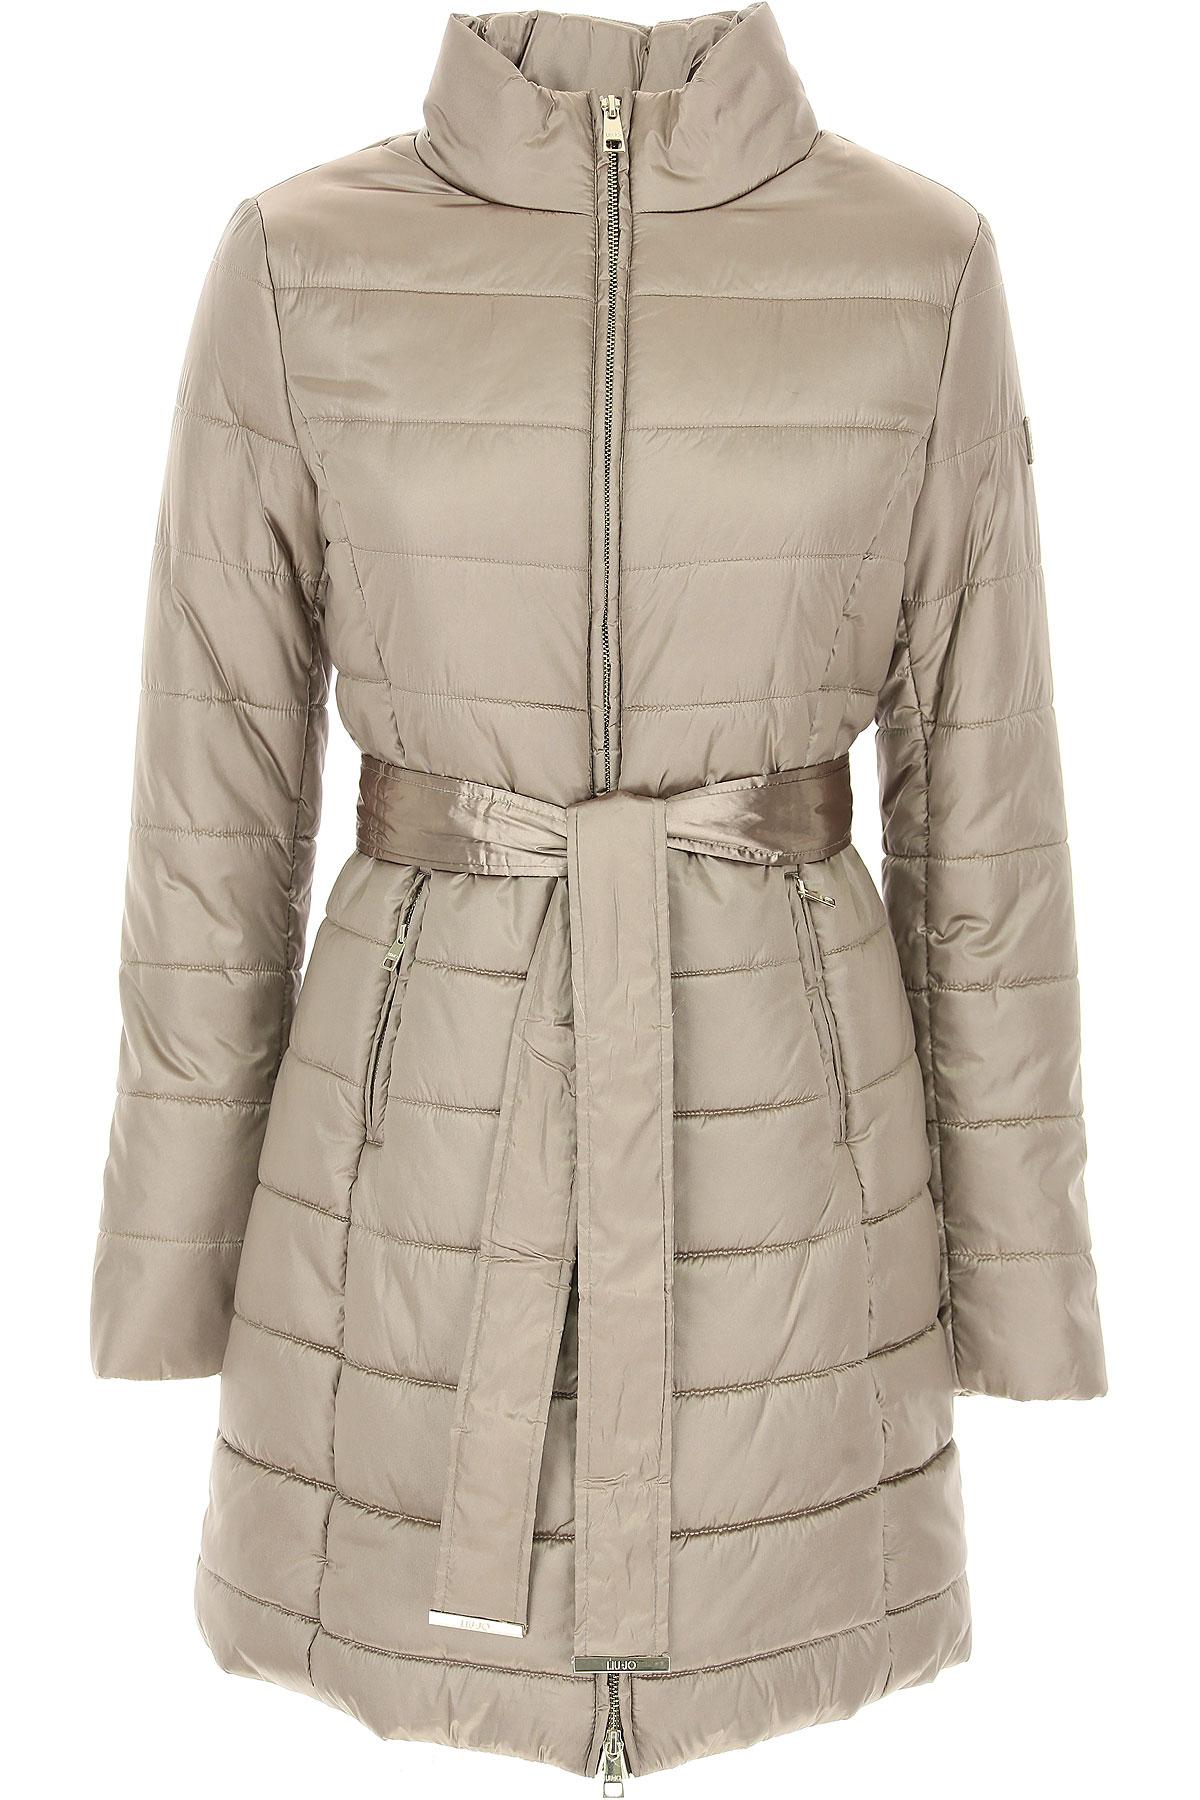 Image of Liu Jo Down Jacket for Women, Puffer Ski Jacket, Platinum, polyester, 2017, 10 4 6 8